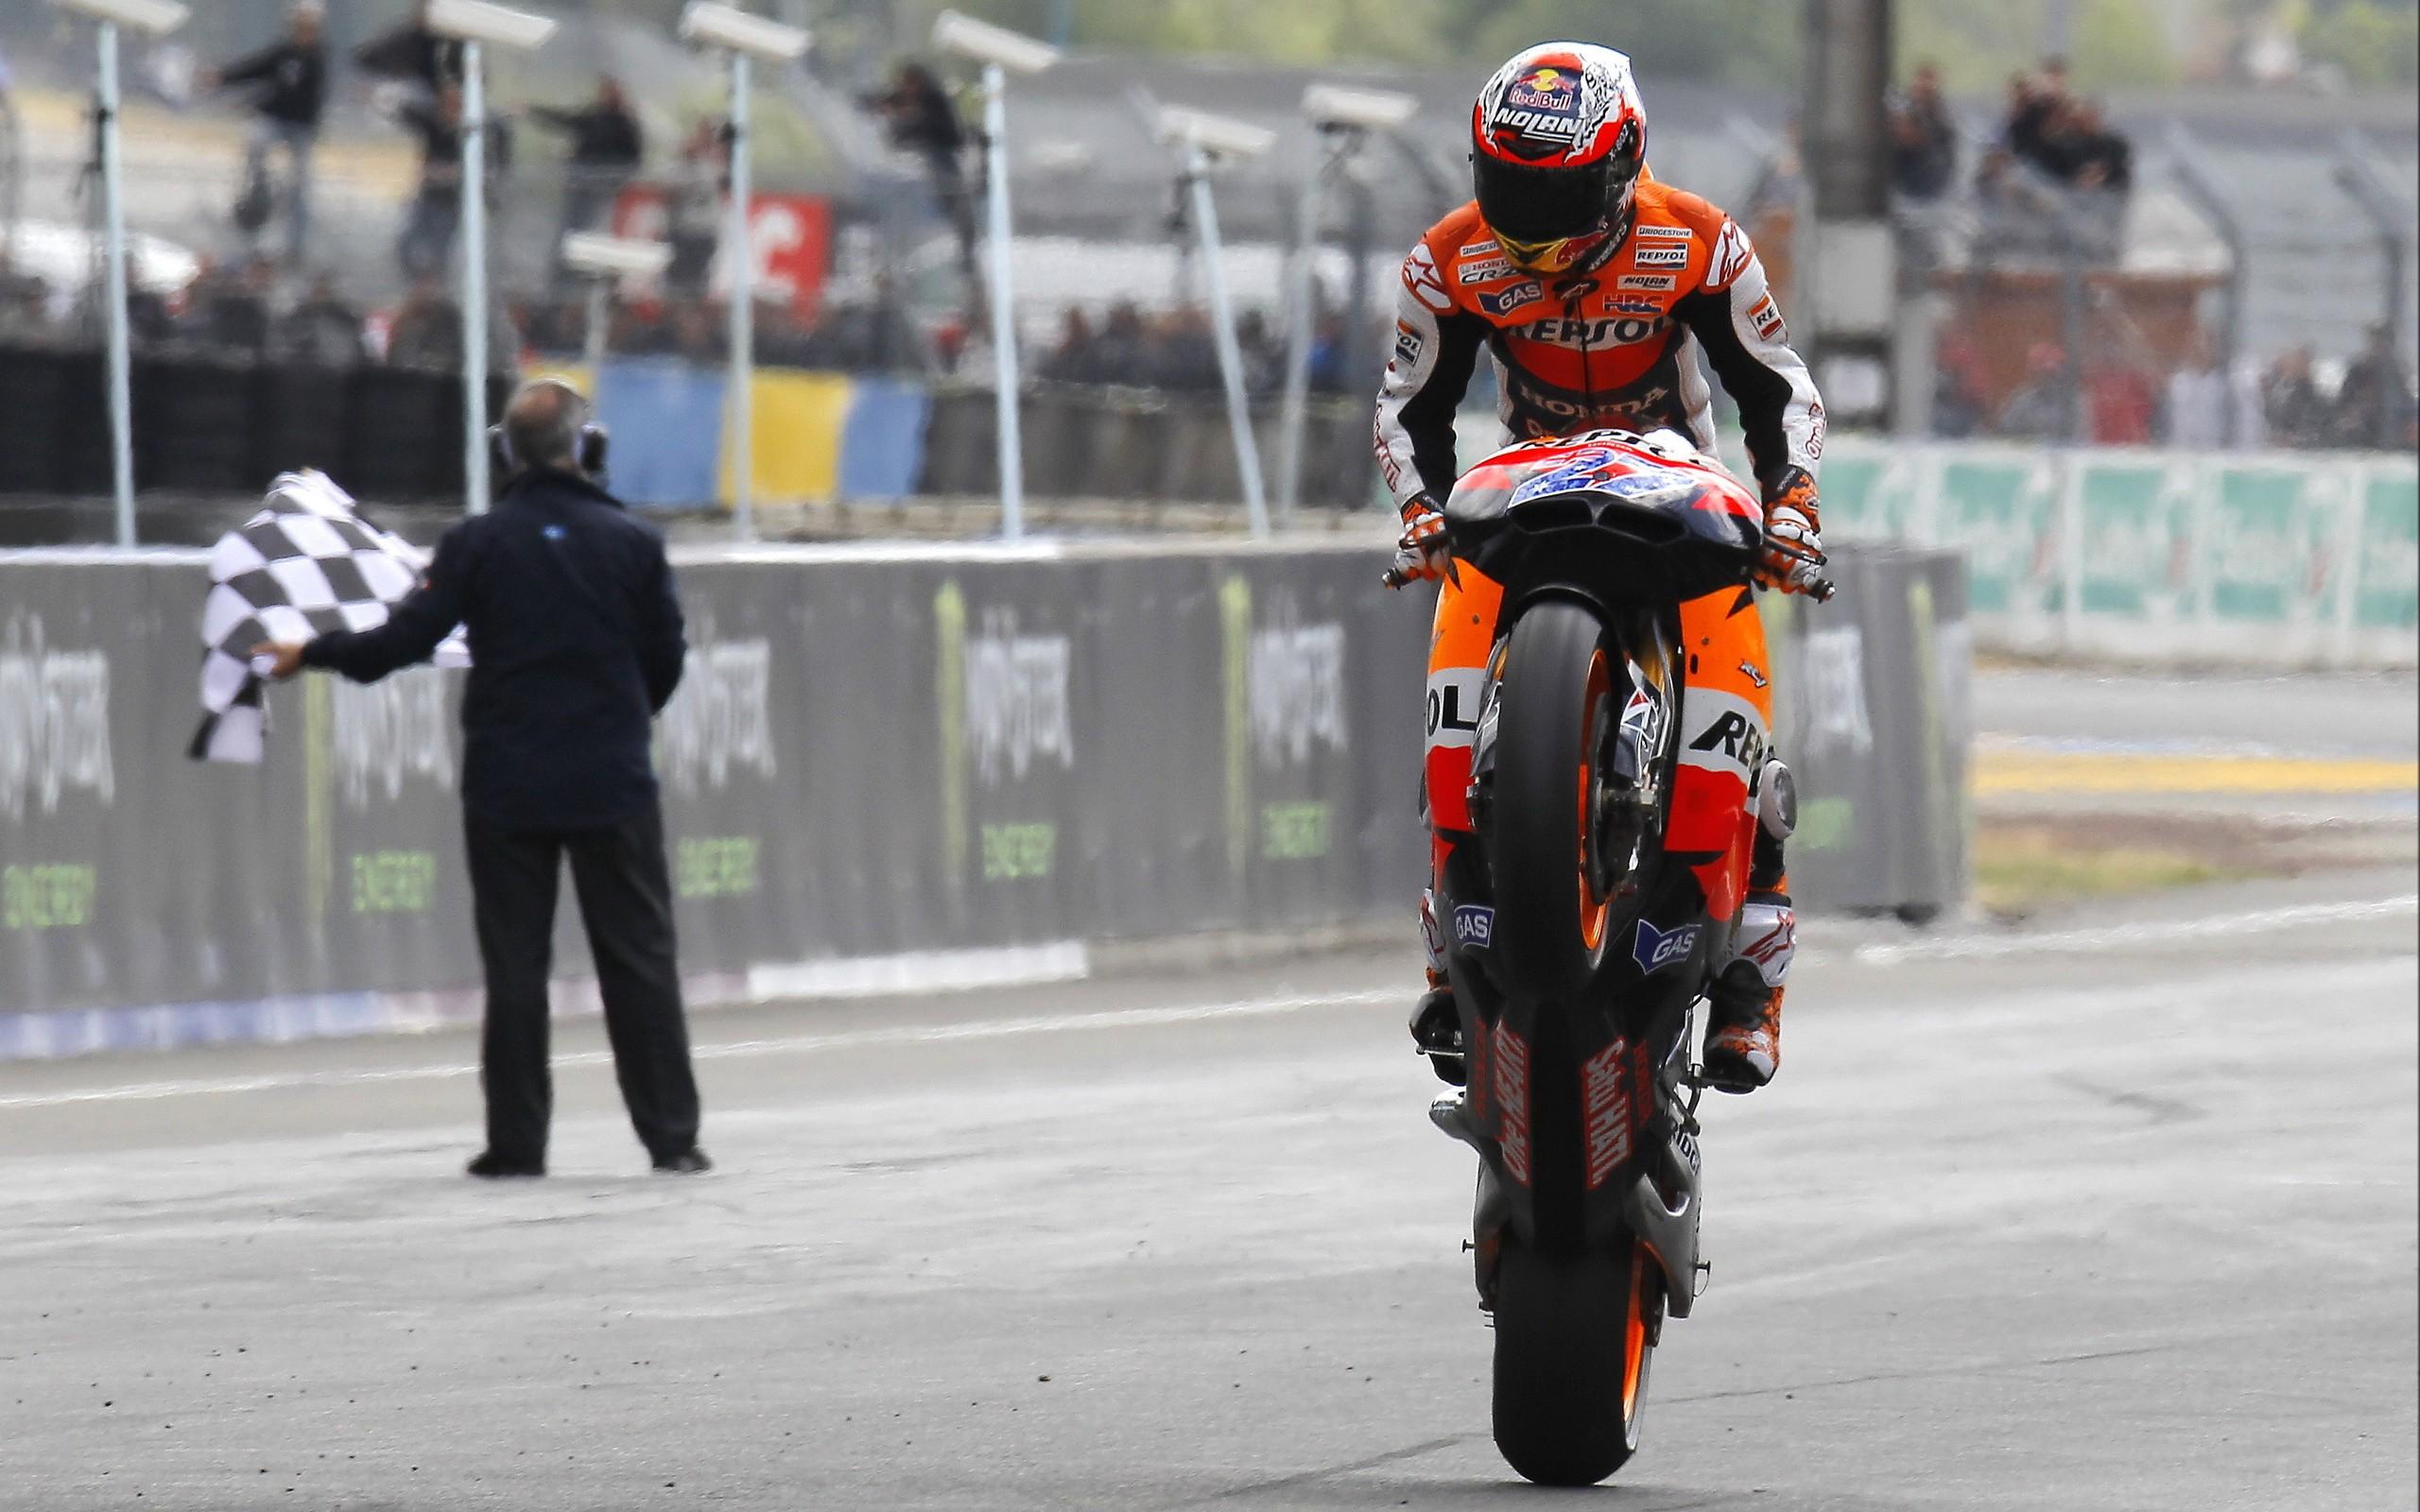 Moto gp motorbikes repsol casey stoner race tracks wallpaper | 2560x1600 | 17534 | WallpaperUP